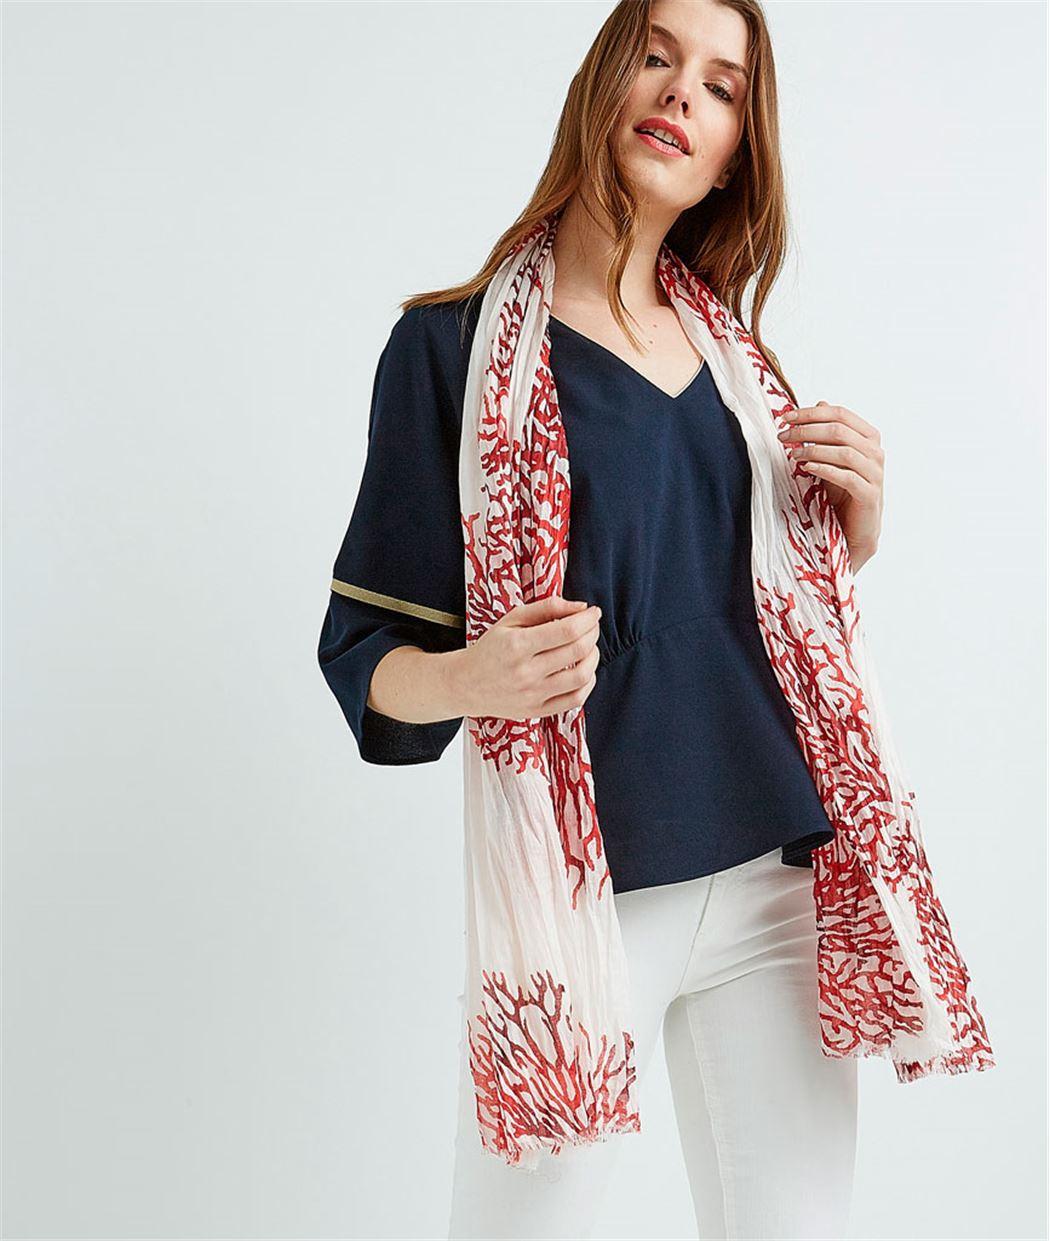 Foulard femme motif corail ROUGE